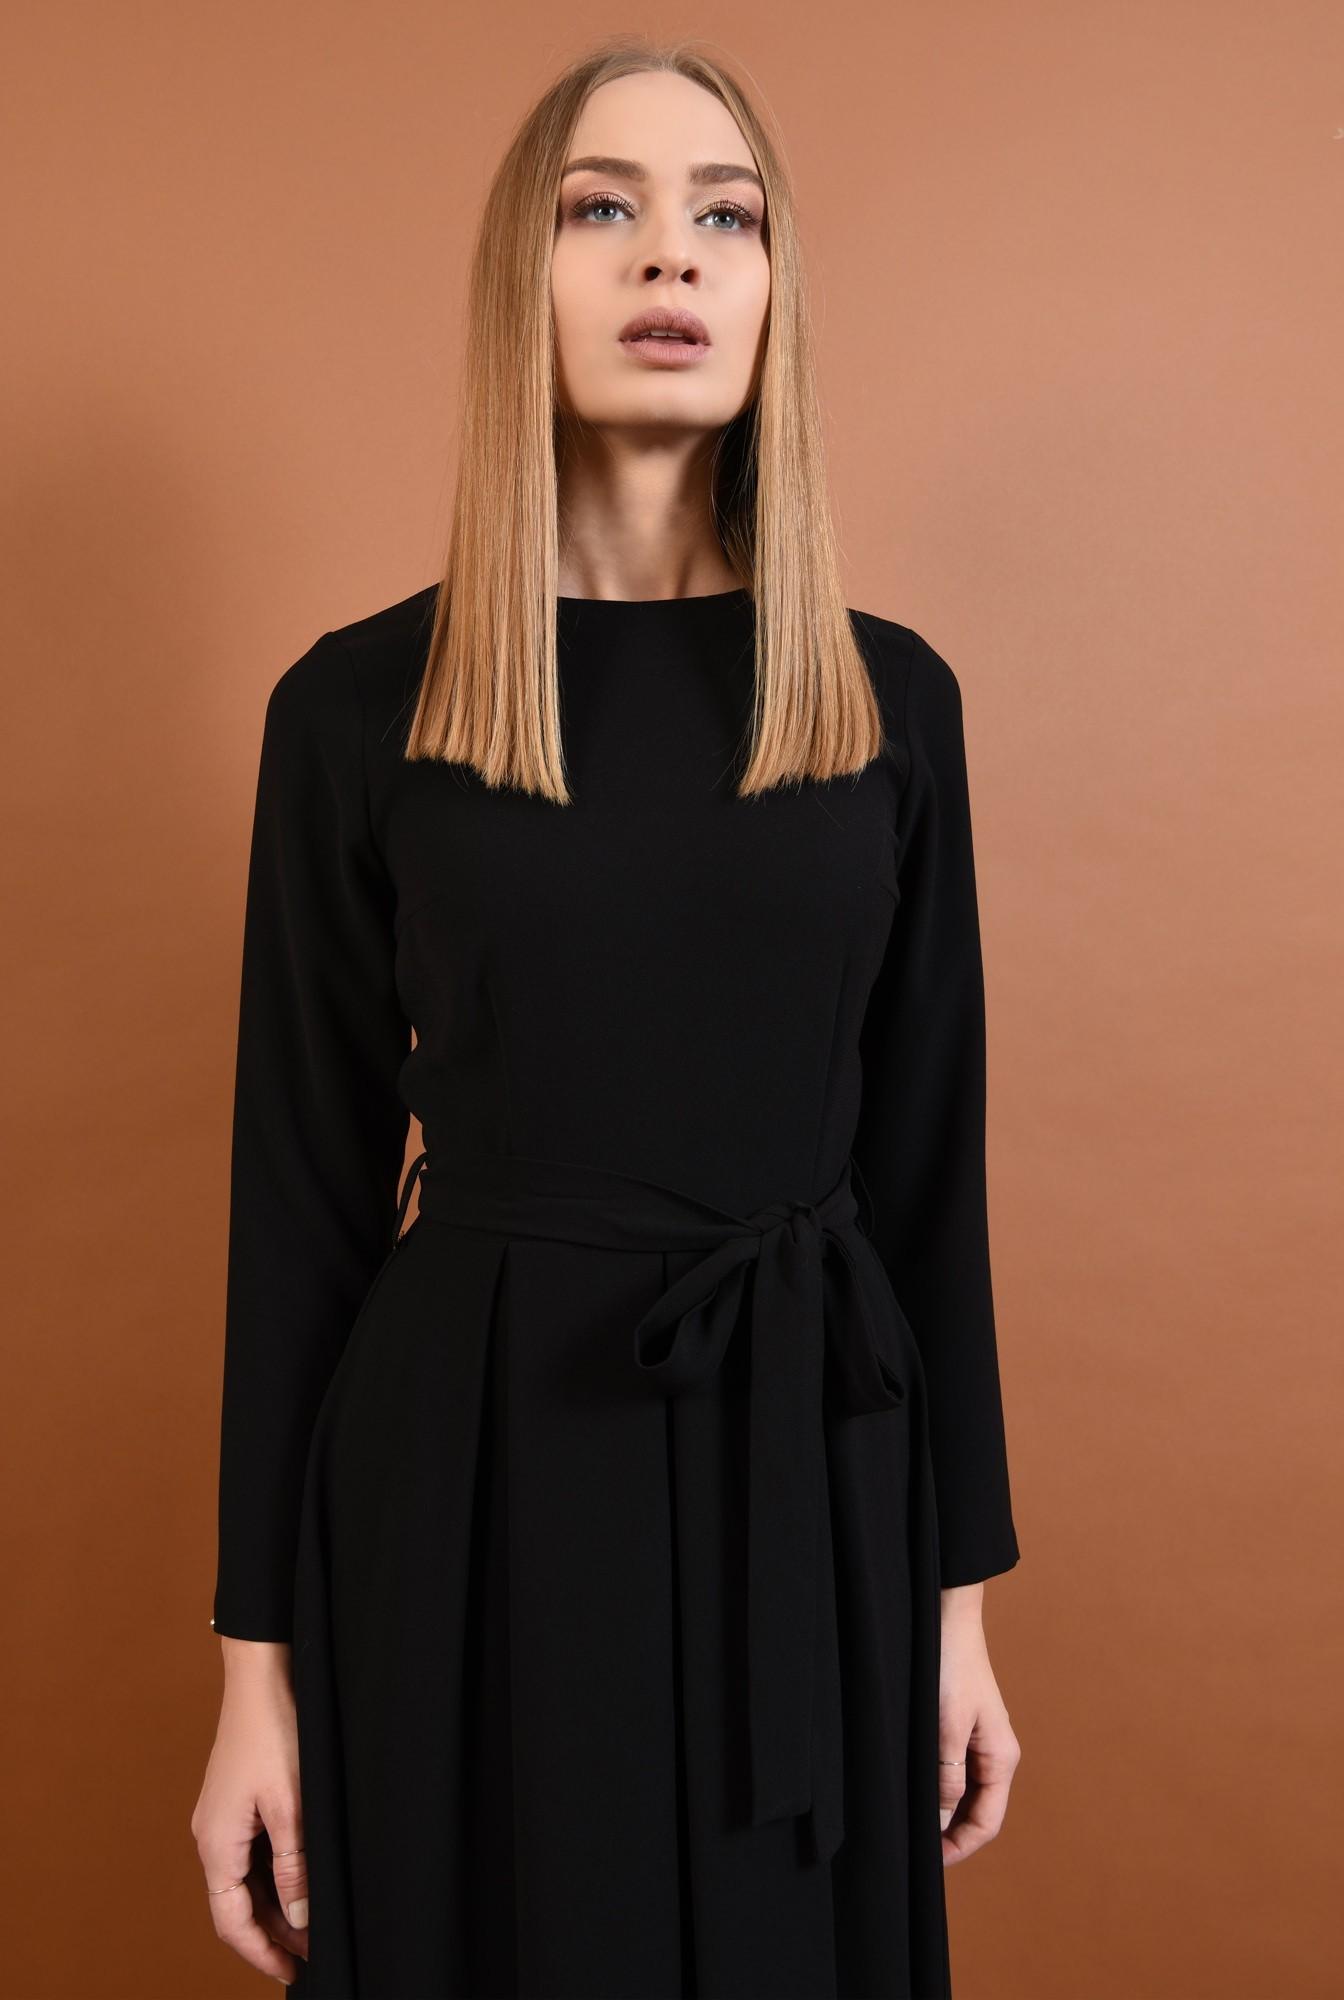 2 - 360 - rochie casual evazata, pliseuri late, cordon, funda, negru